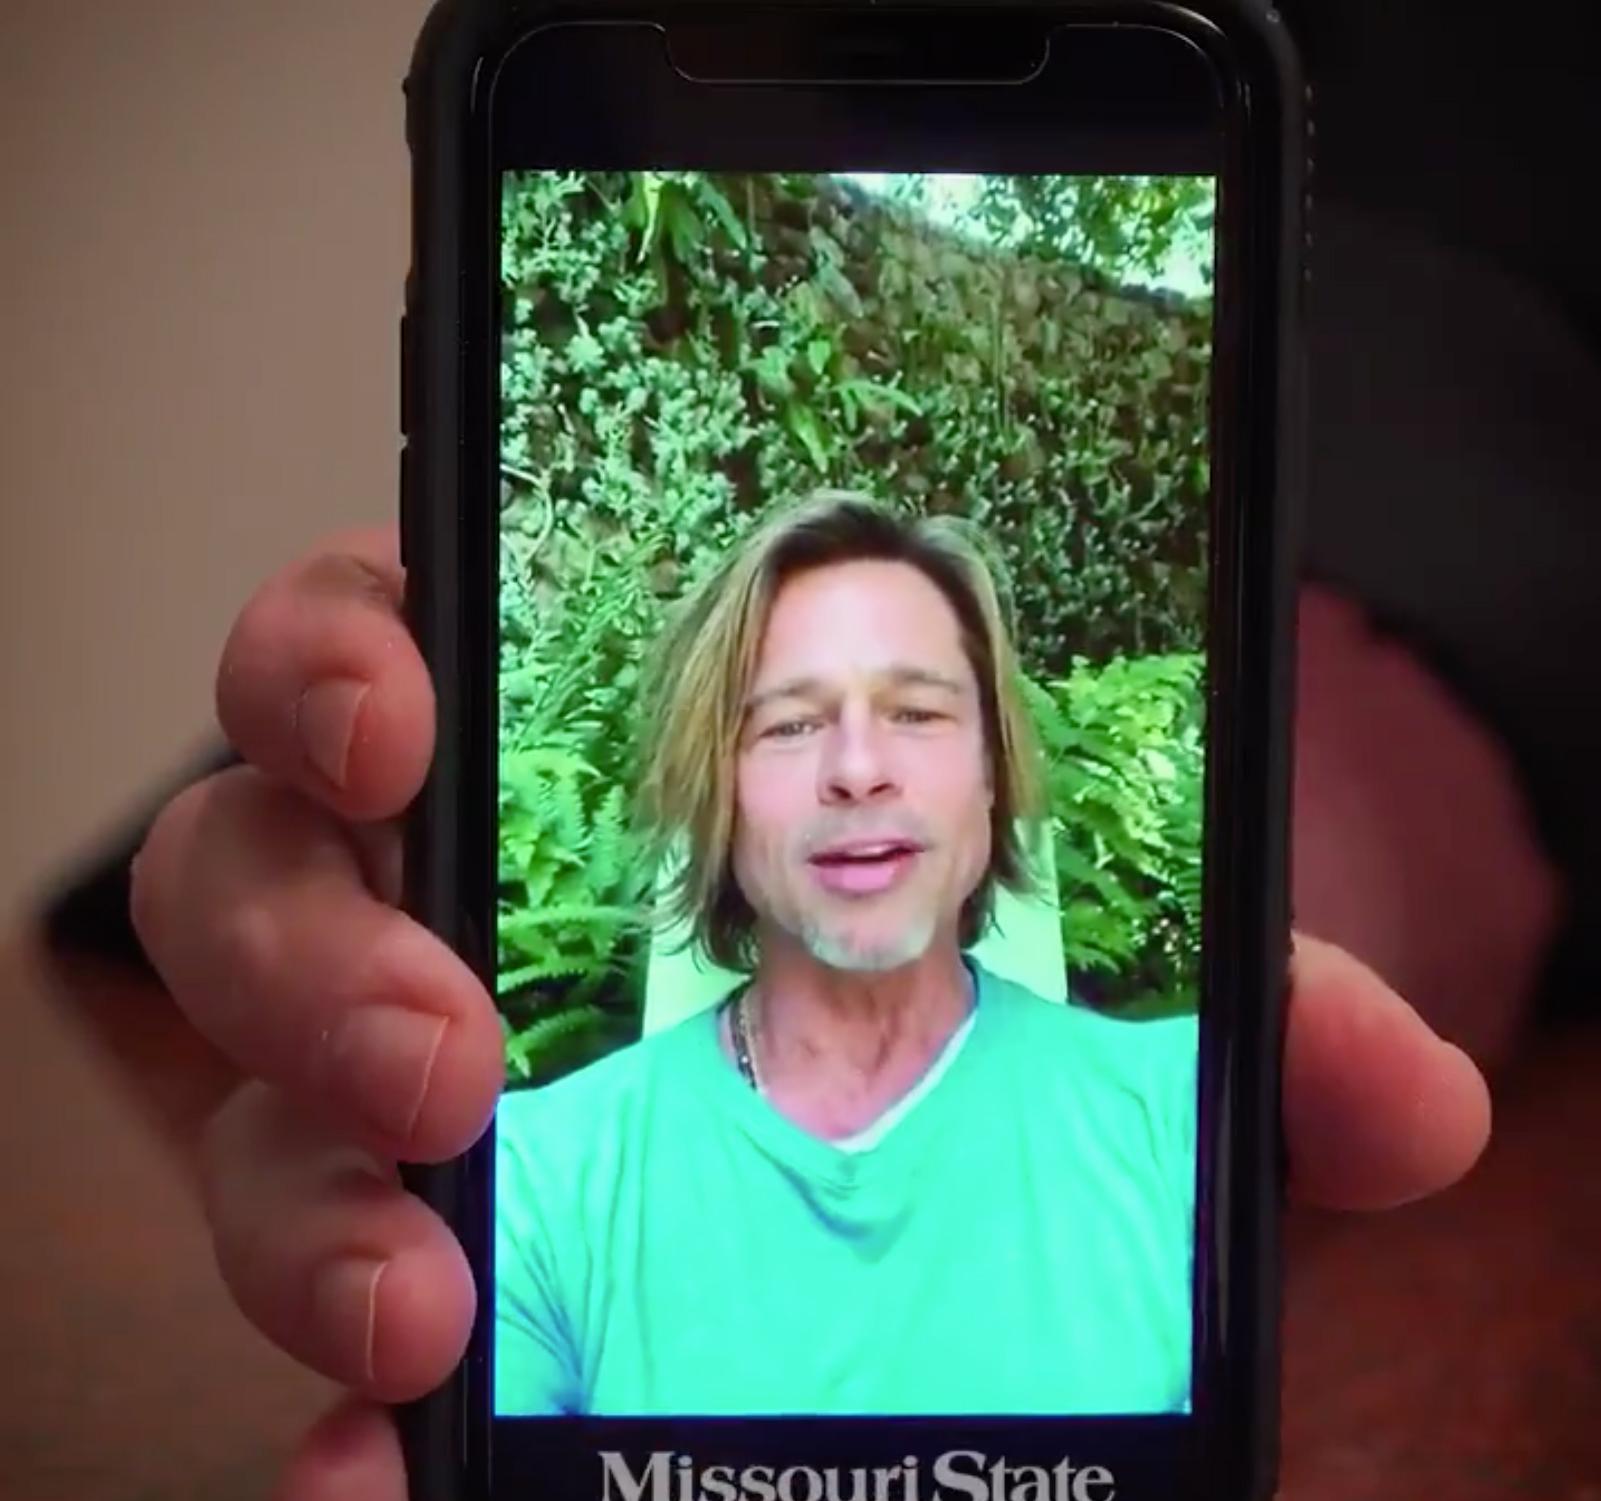 Brad Pitt Surprises Missouri State Grads With Heartfelt Message